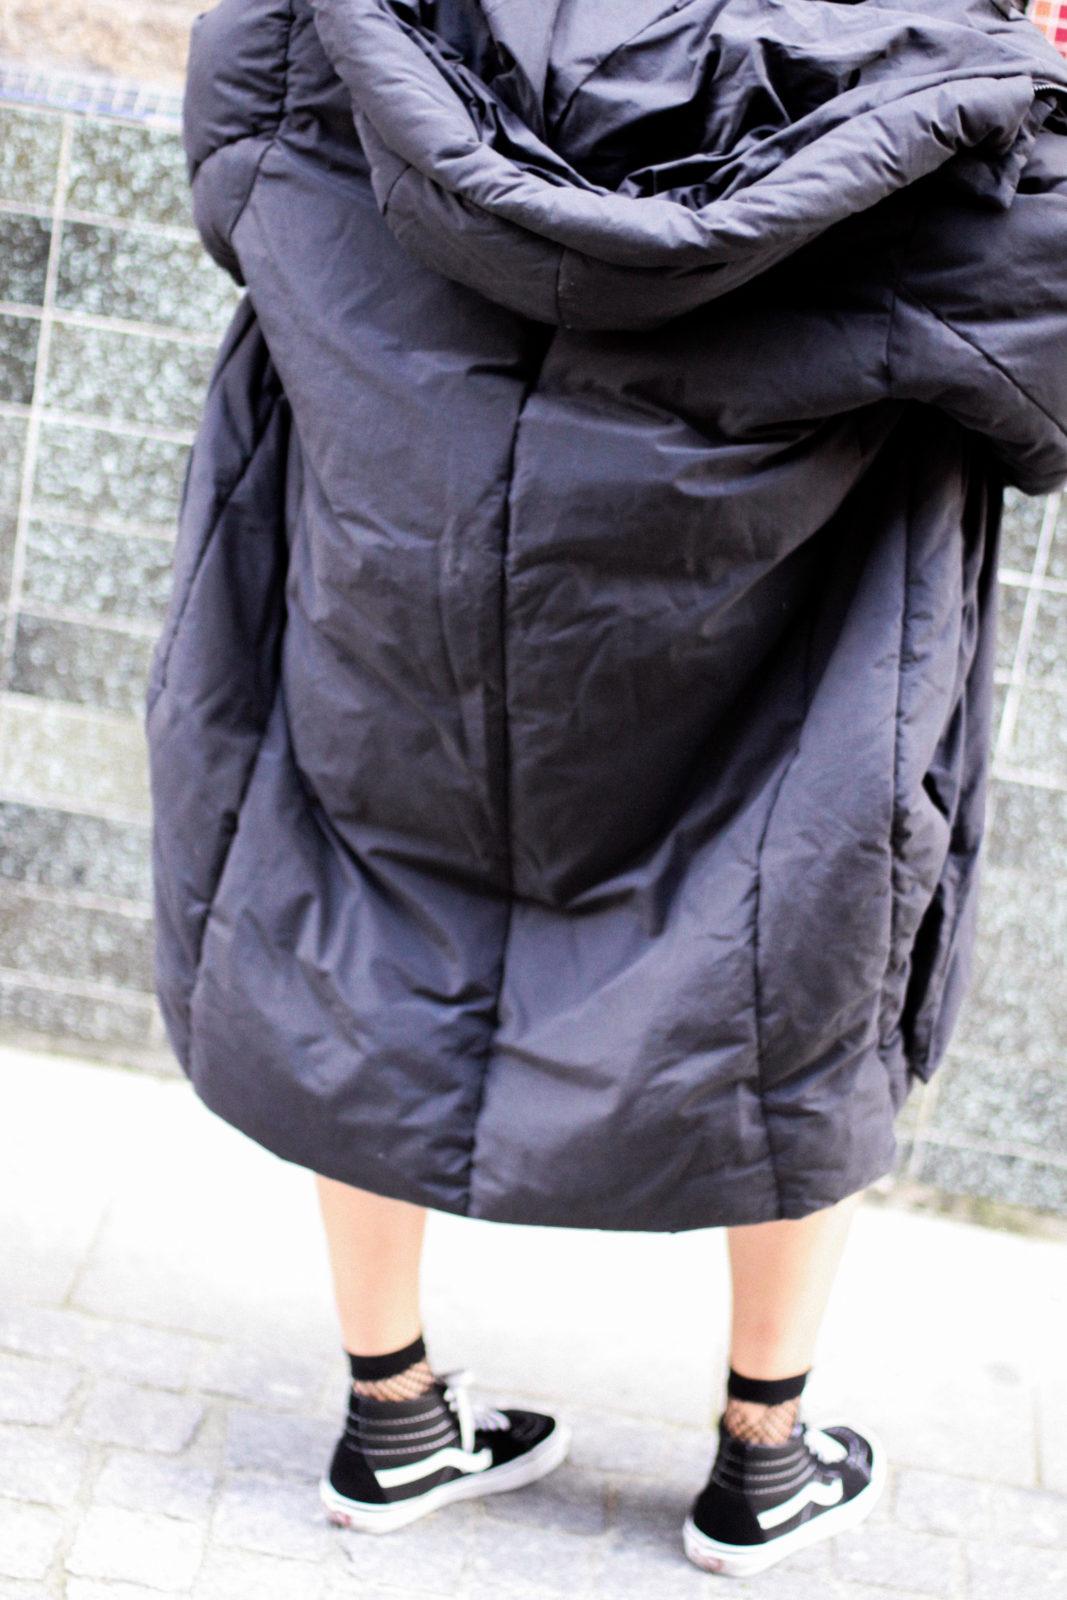 puffer_coat_plumifero_maxi_abrigo_calcetines_rejilla_falda_midi_metalizados_beanie_choker_vans-22